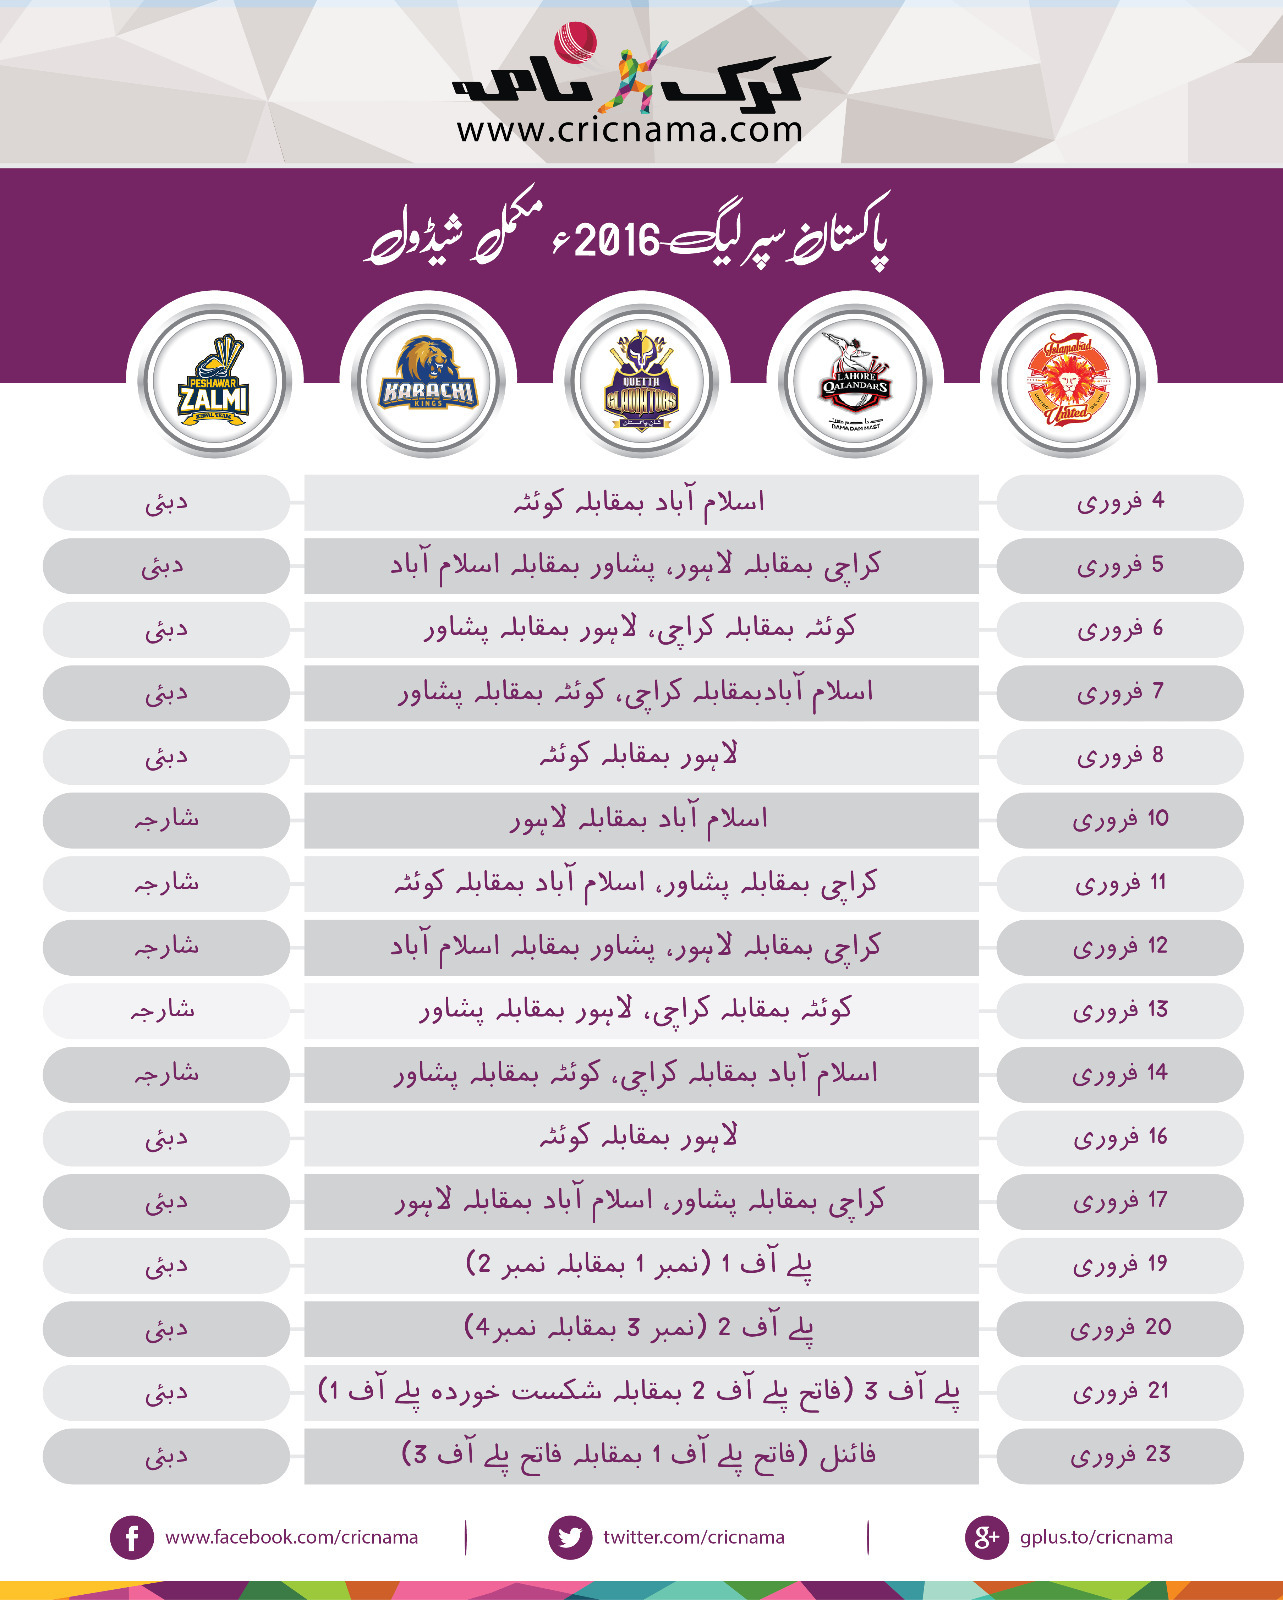 PSL-2016-schedule